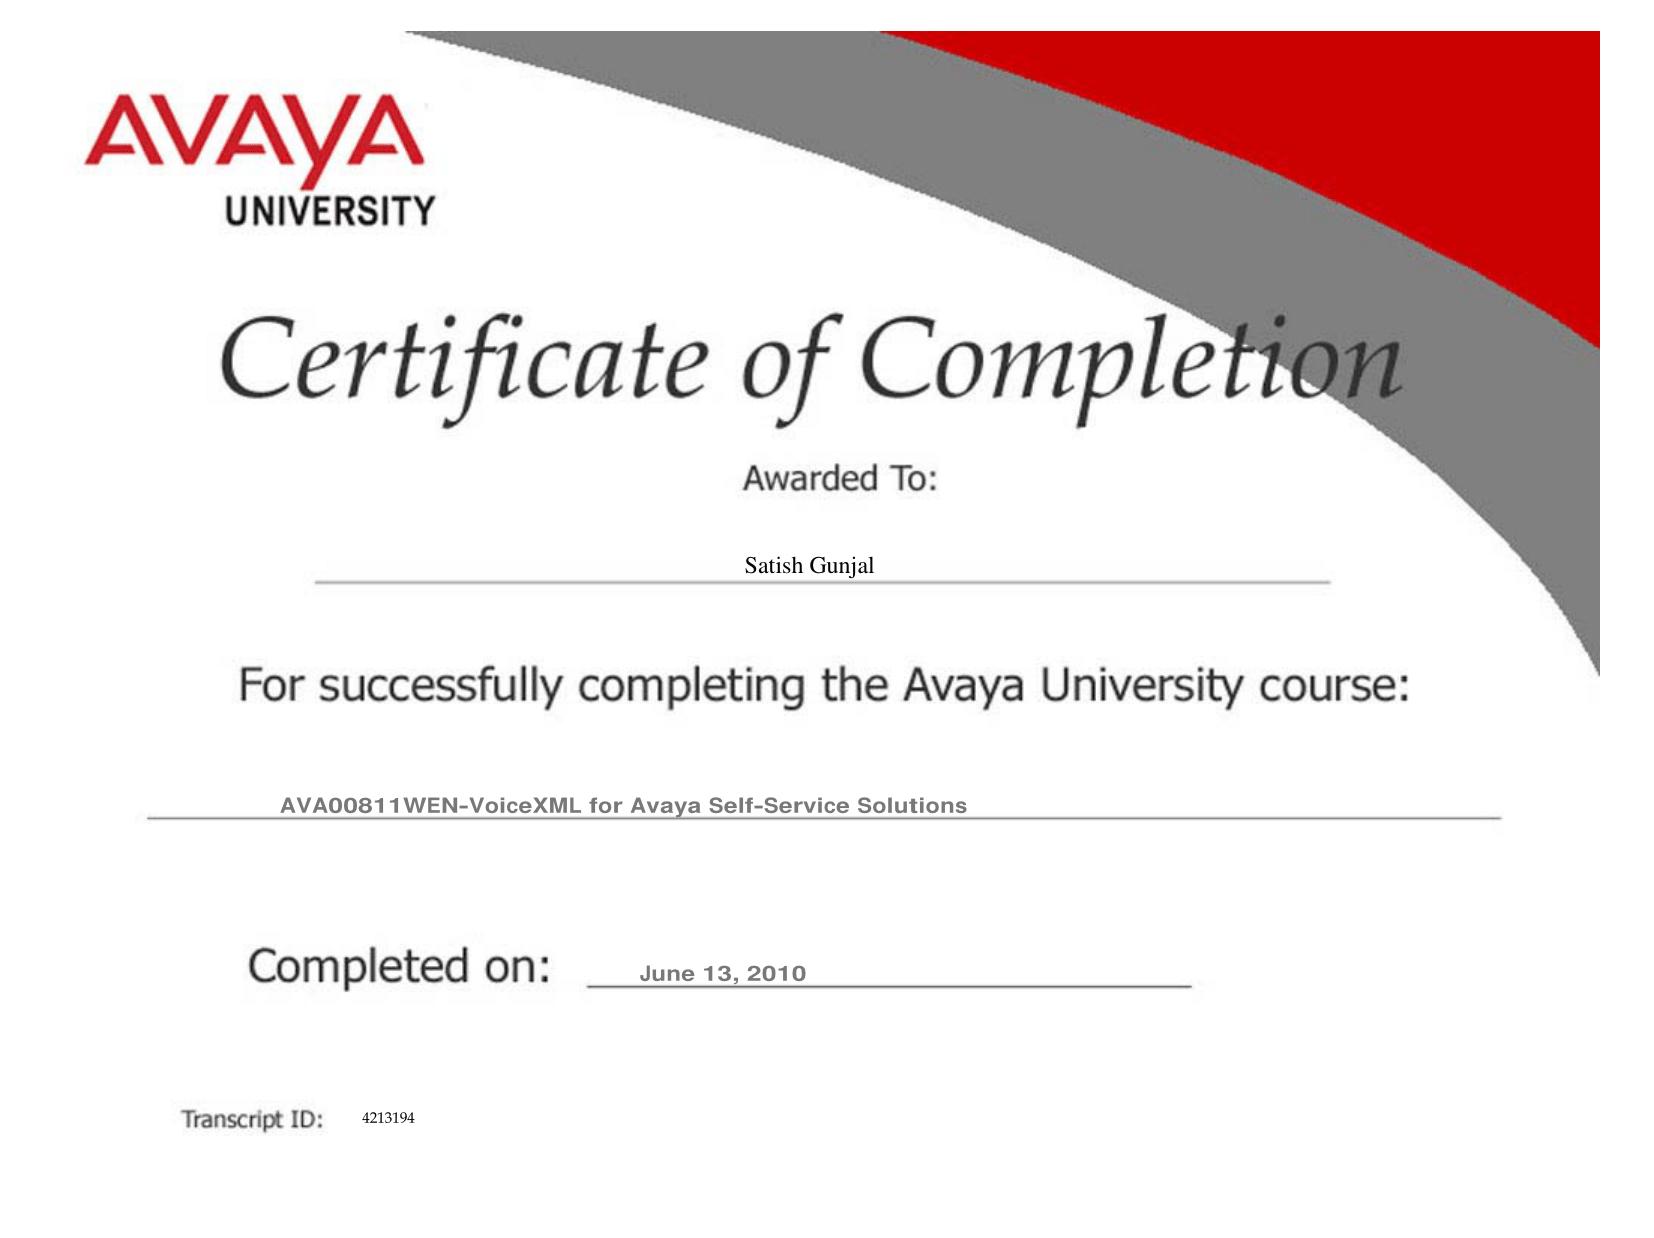 Avaya VoiceXML for Avaya Self Service Solutions